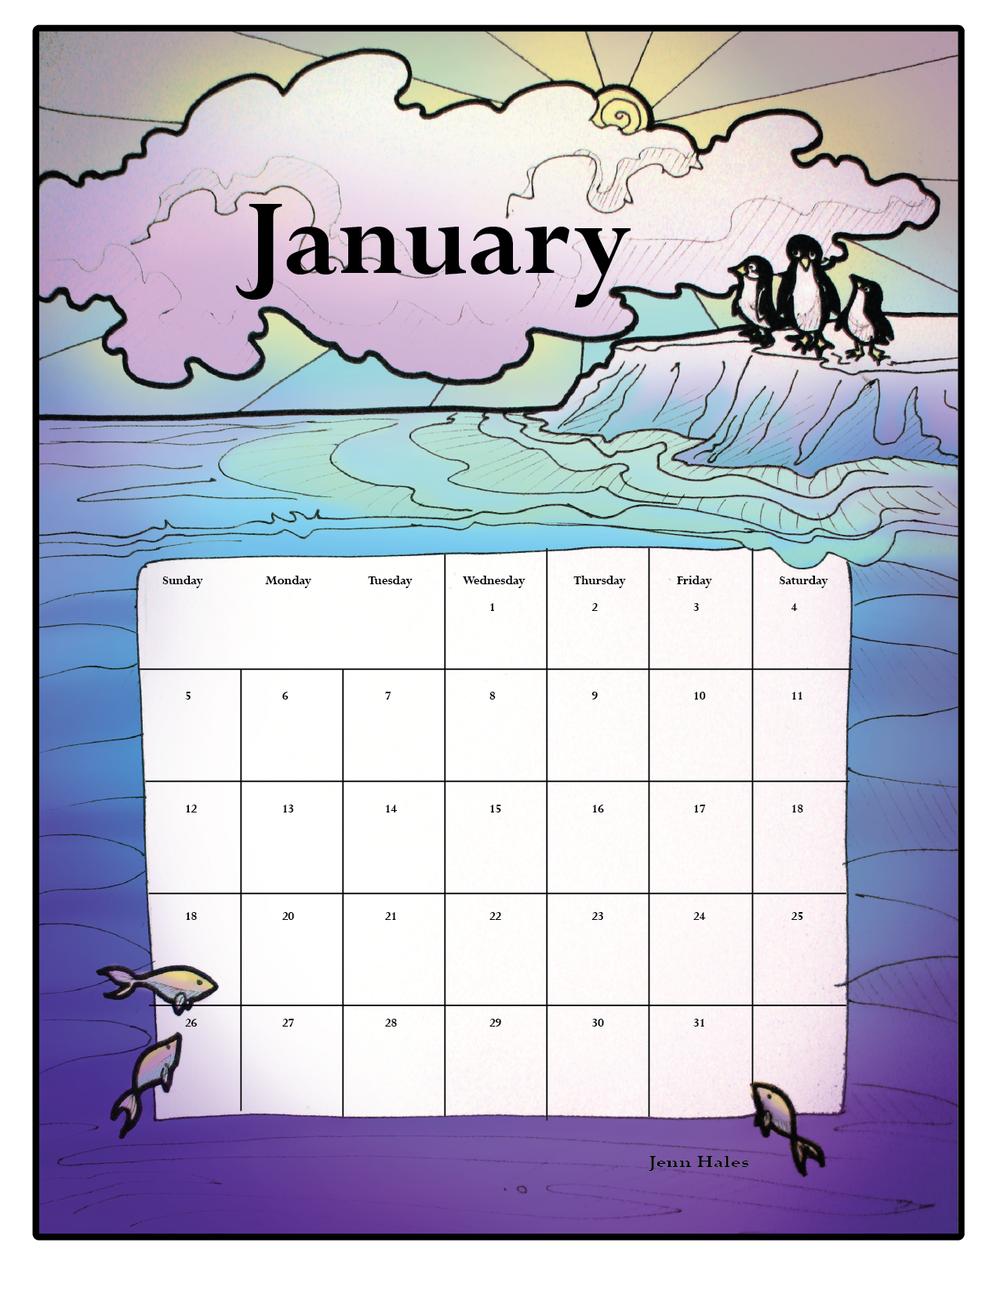 January Calendar - Jan 2, 2014